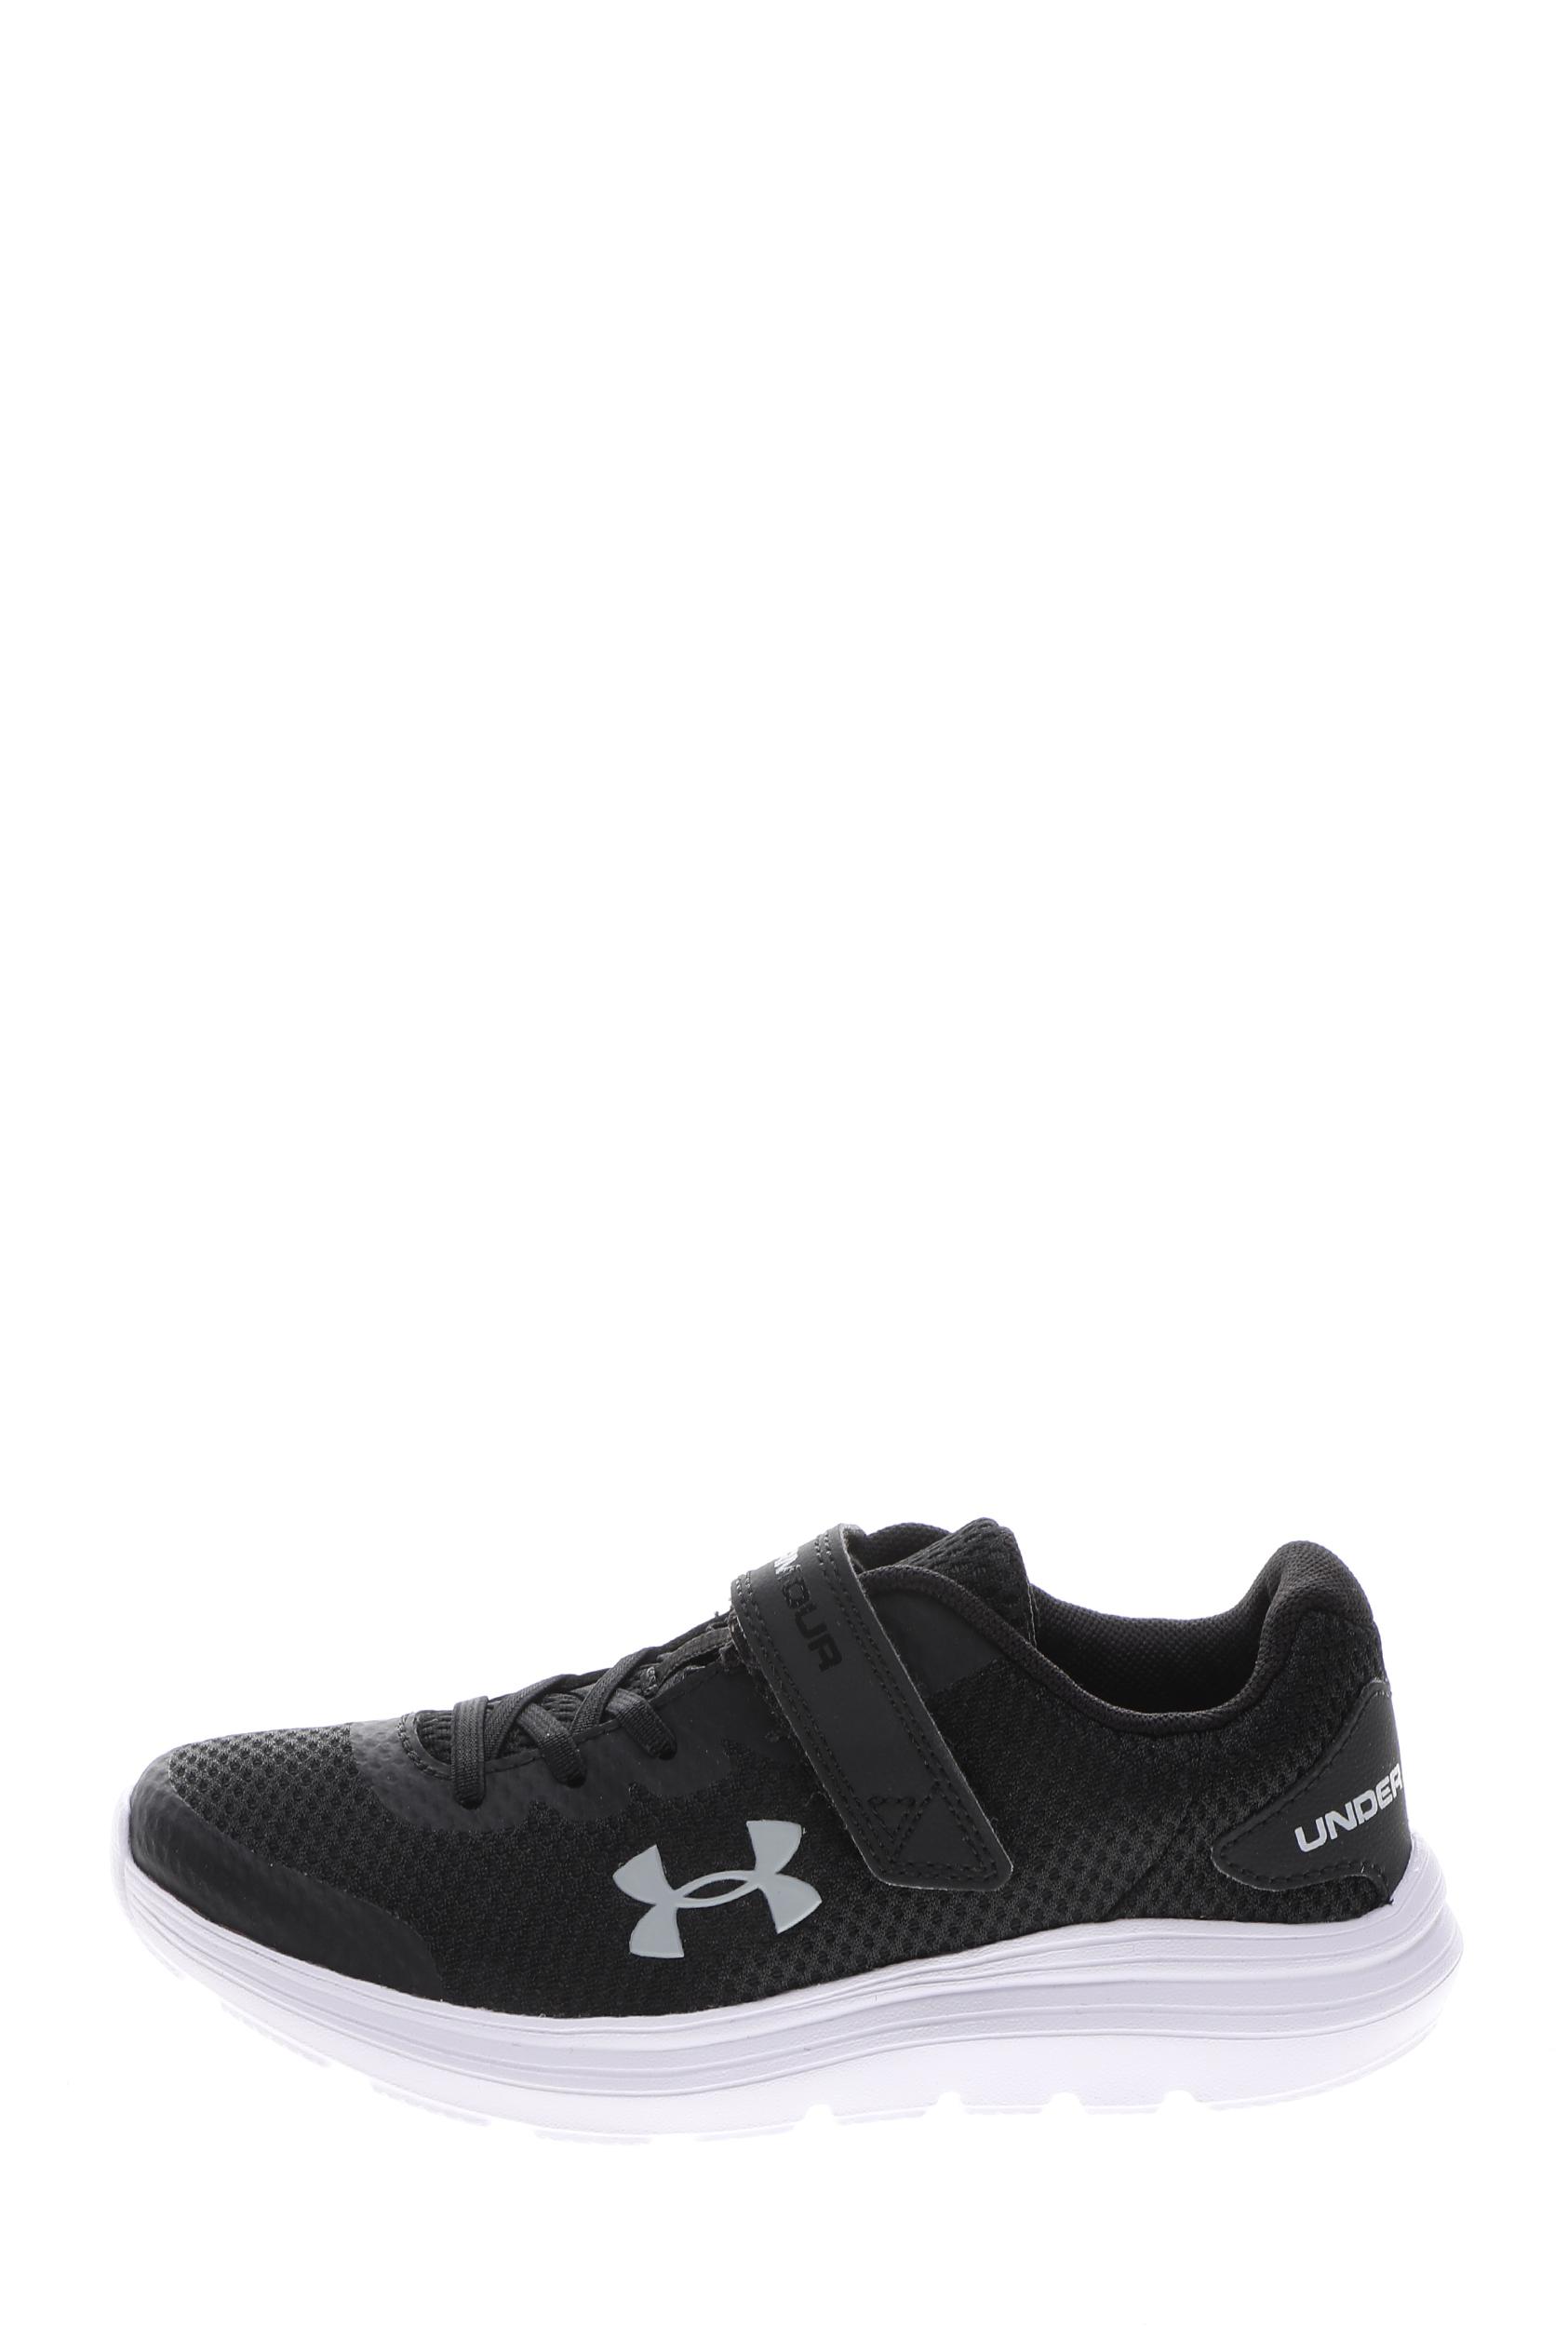 UNDER ARMOUR – Παιδικά αθλητικά παπούτσια UA PS Surge 2 AC μαύρα